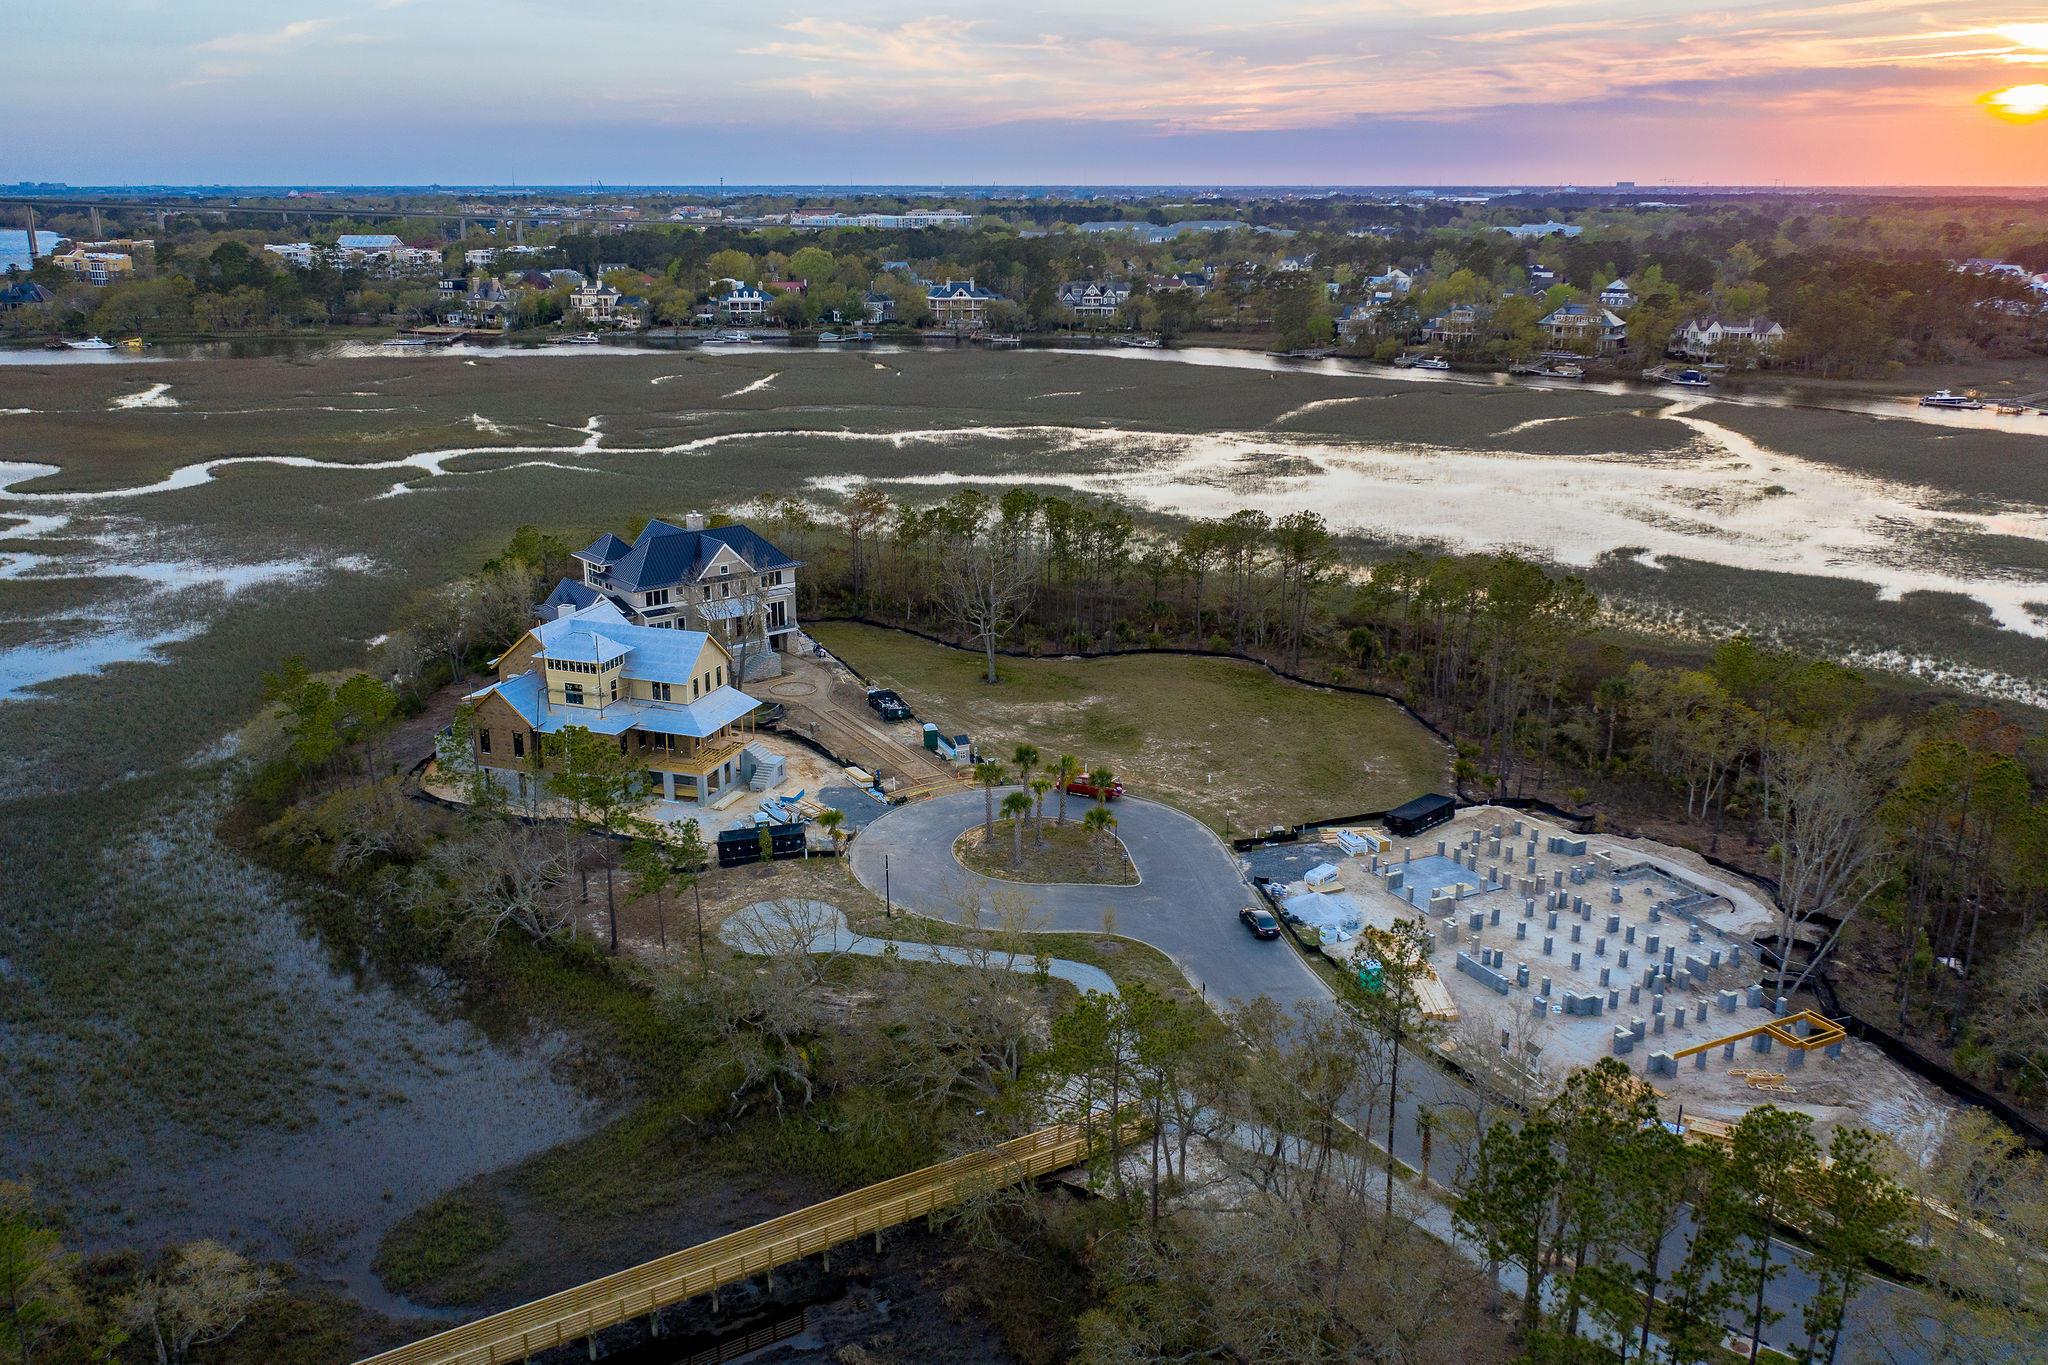 Daniel Island Park Homes For Sale - 113 Captains Island, Charleston, SC - 11